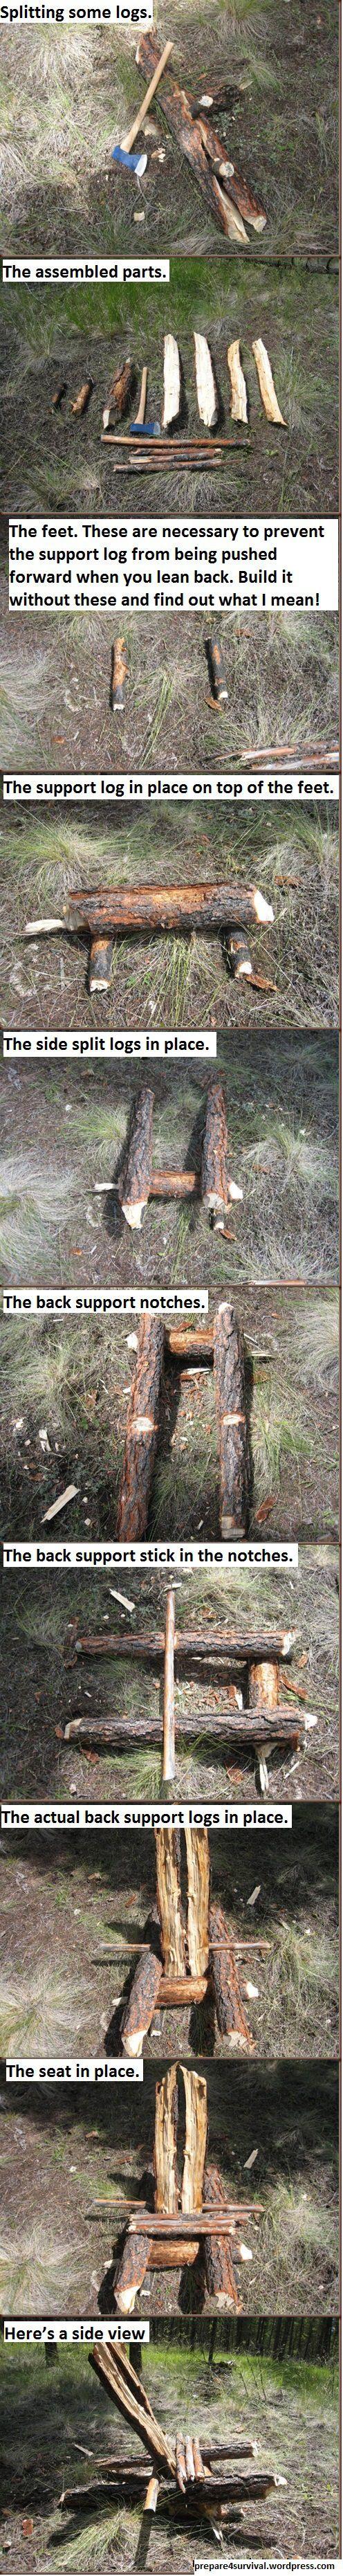 DIY Bushcraft Camp Chair No Cordage Required